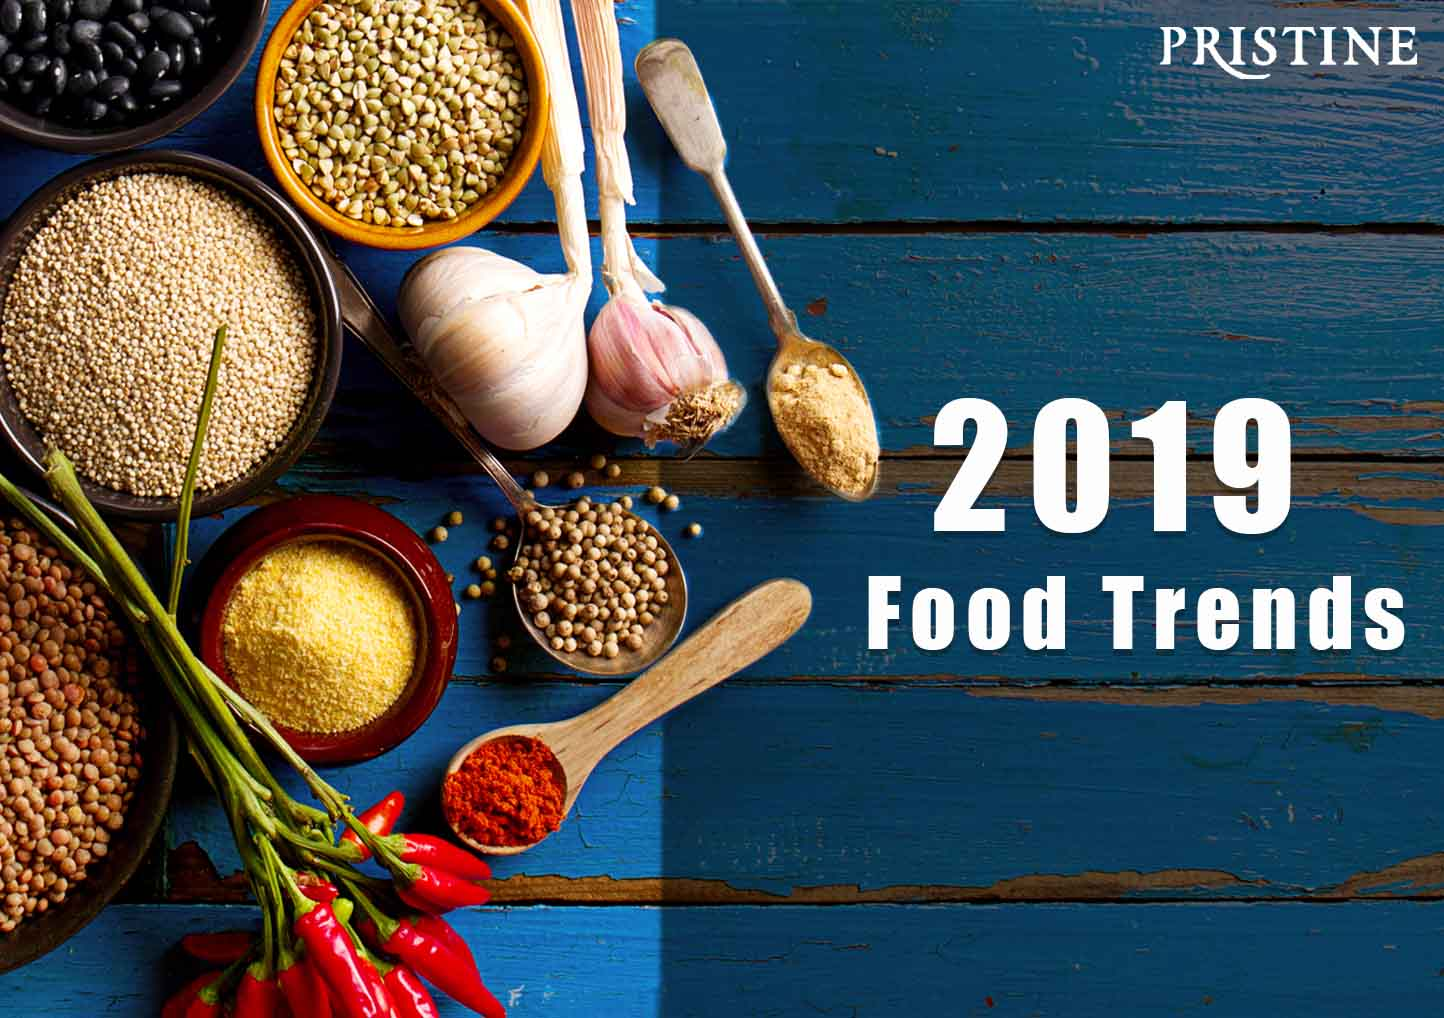 Food-trends-2019-Pristine-Organic